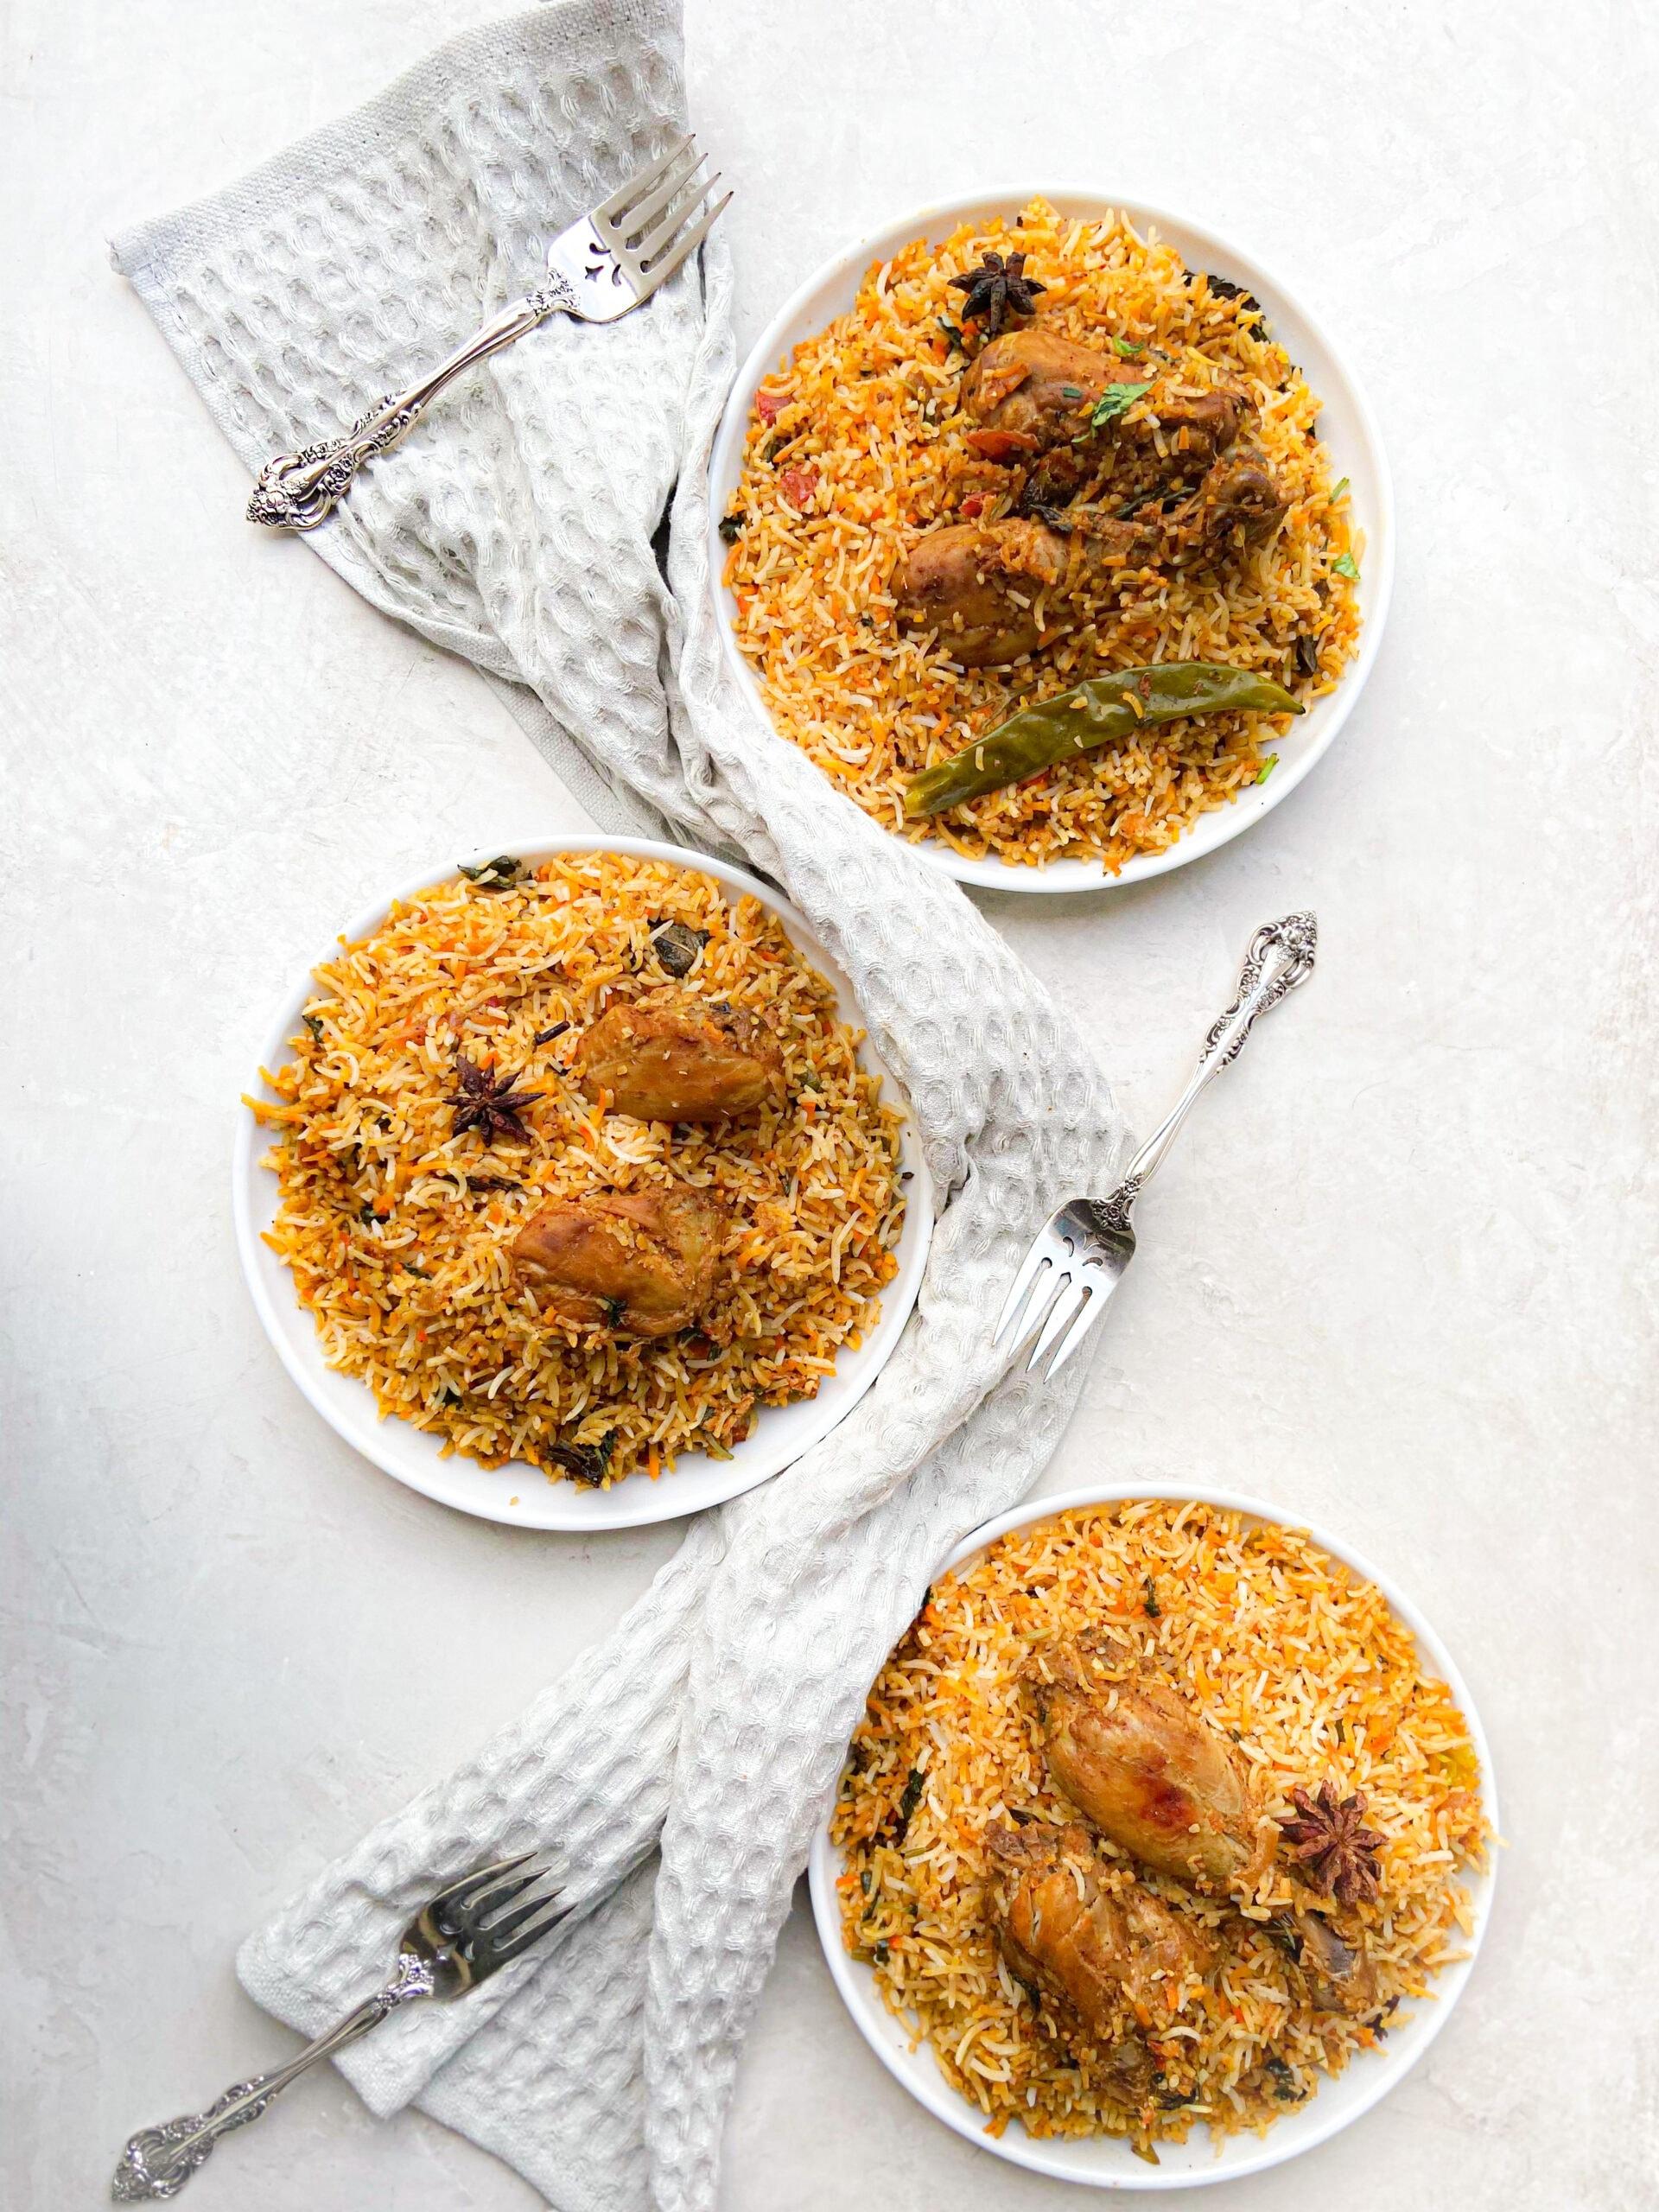 3 plates of briyani